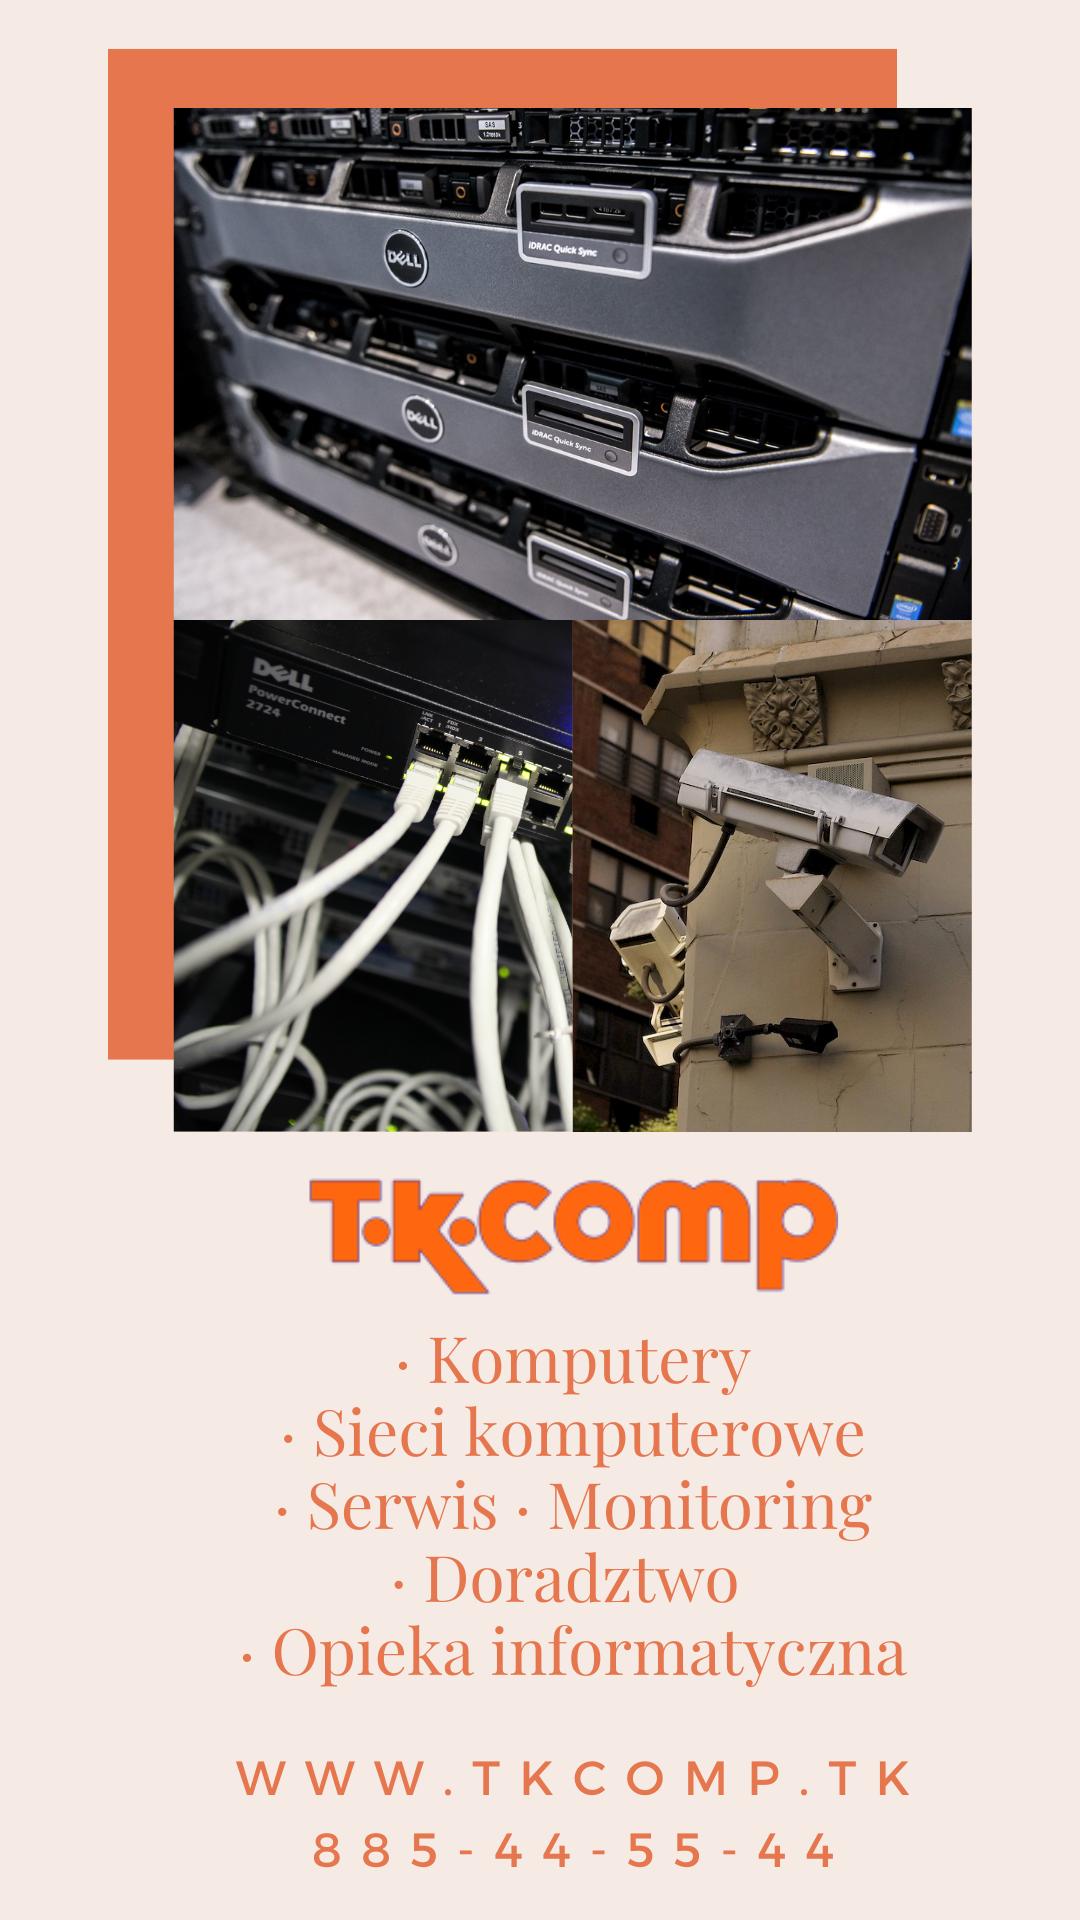 T.K.COMP